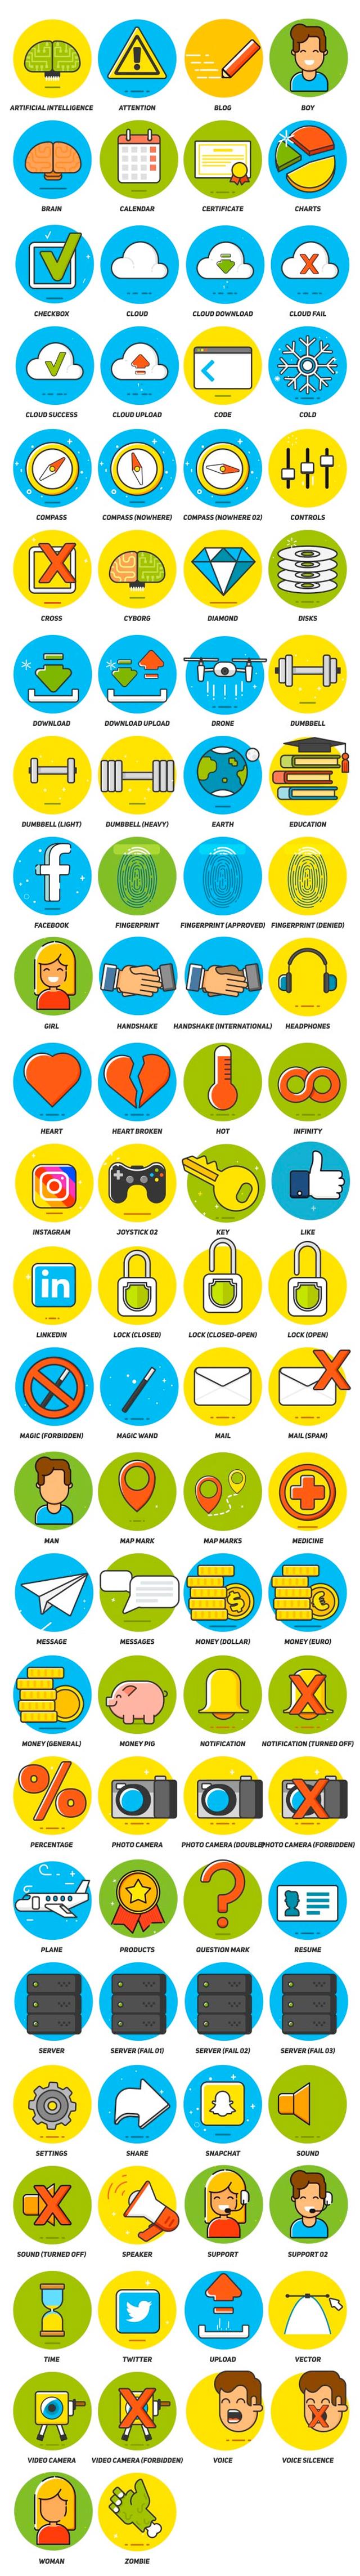 aejuice flat icons